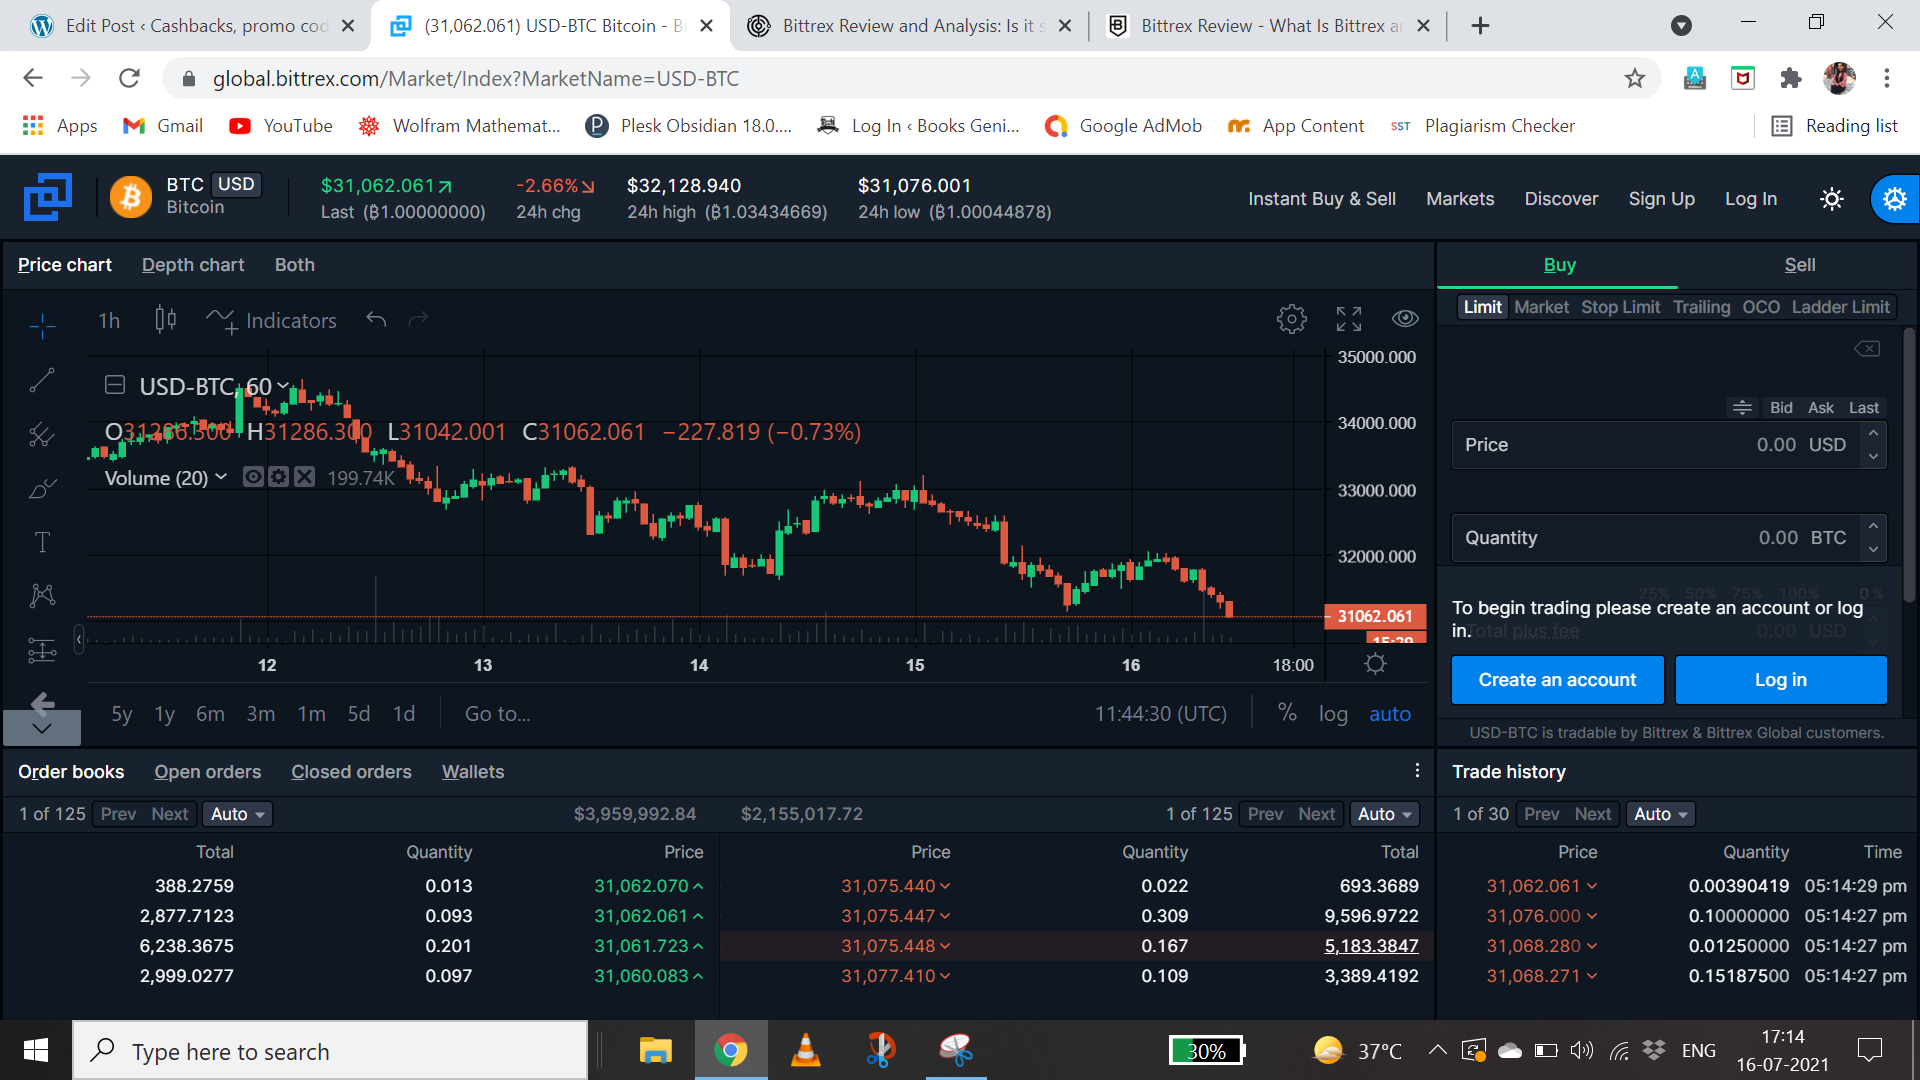 bittrex trading view